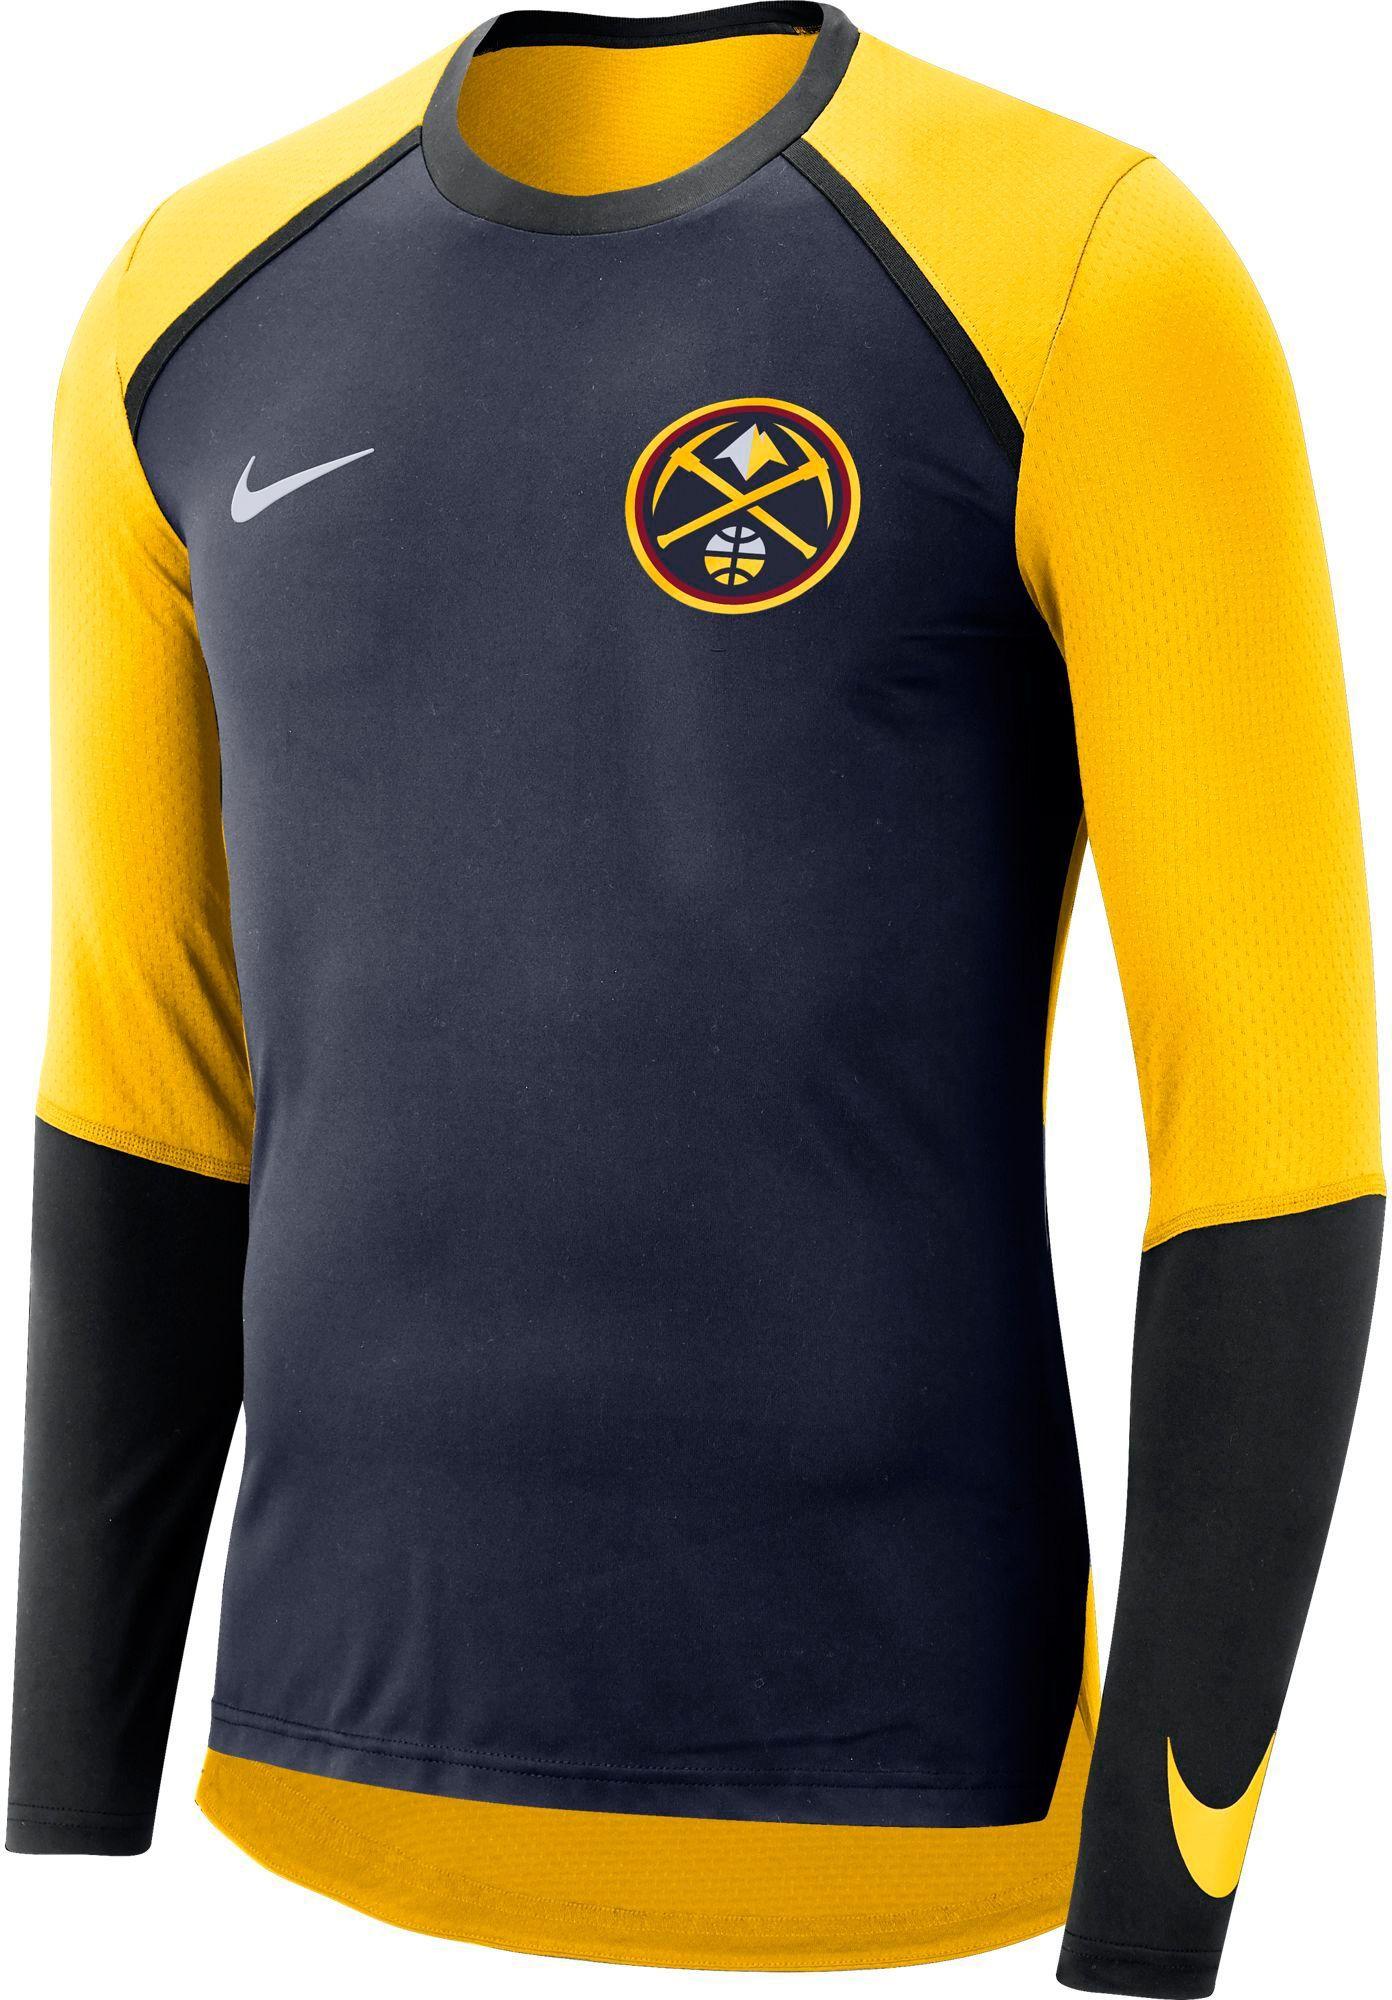 0f29e1eb82e3a Nike Men s Denver Nuggets Dri-FIT Long Sleeve Shirt, Size  XL, Team ...